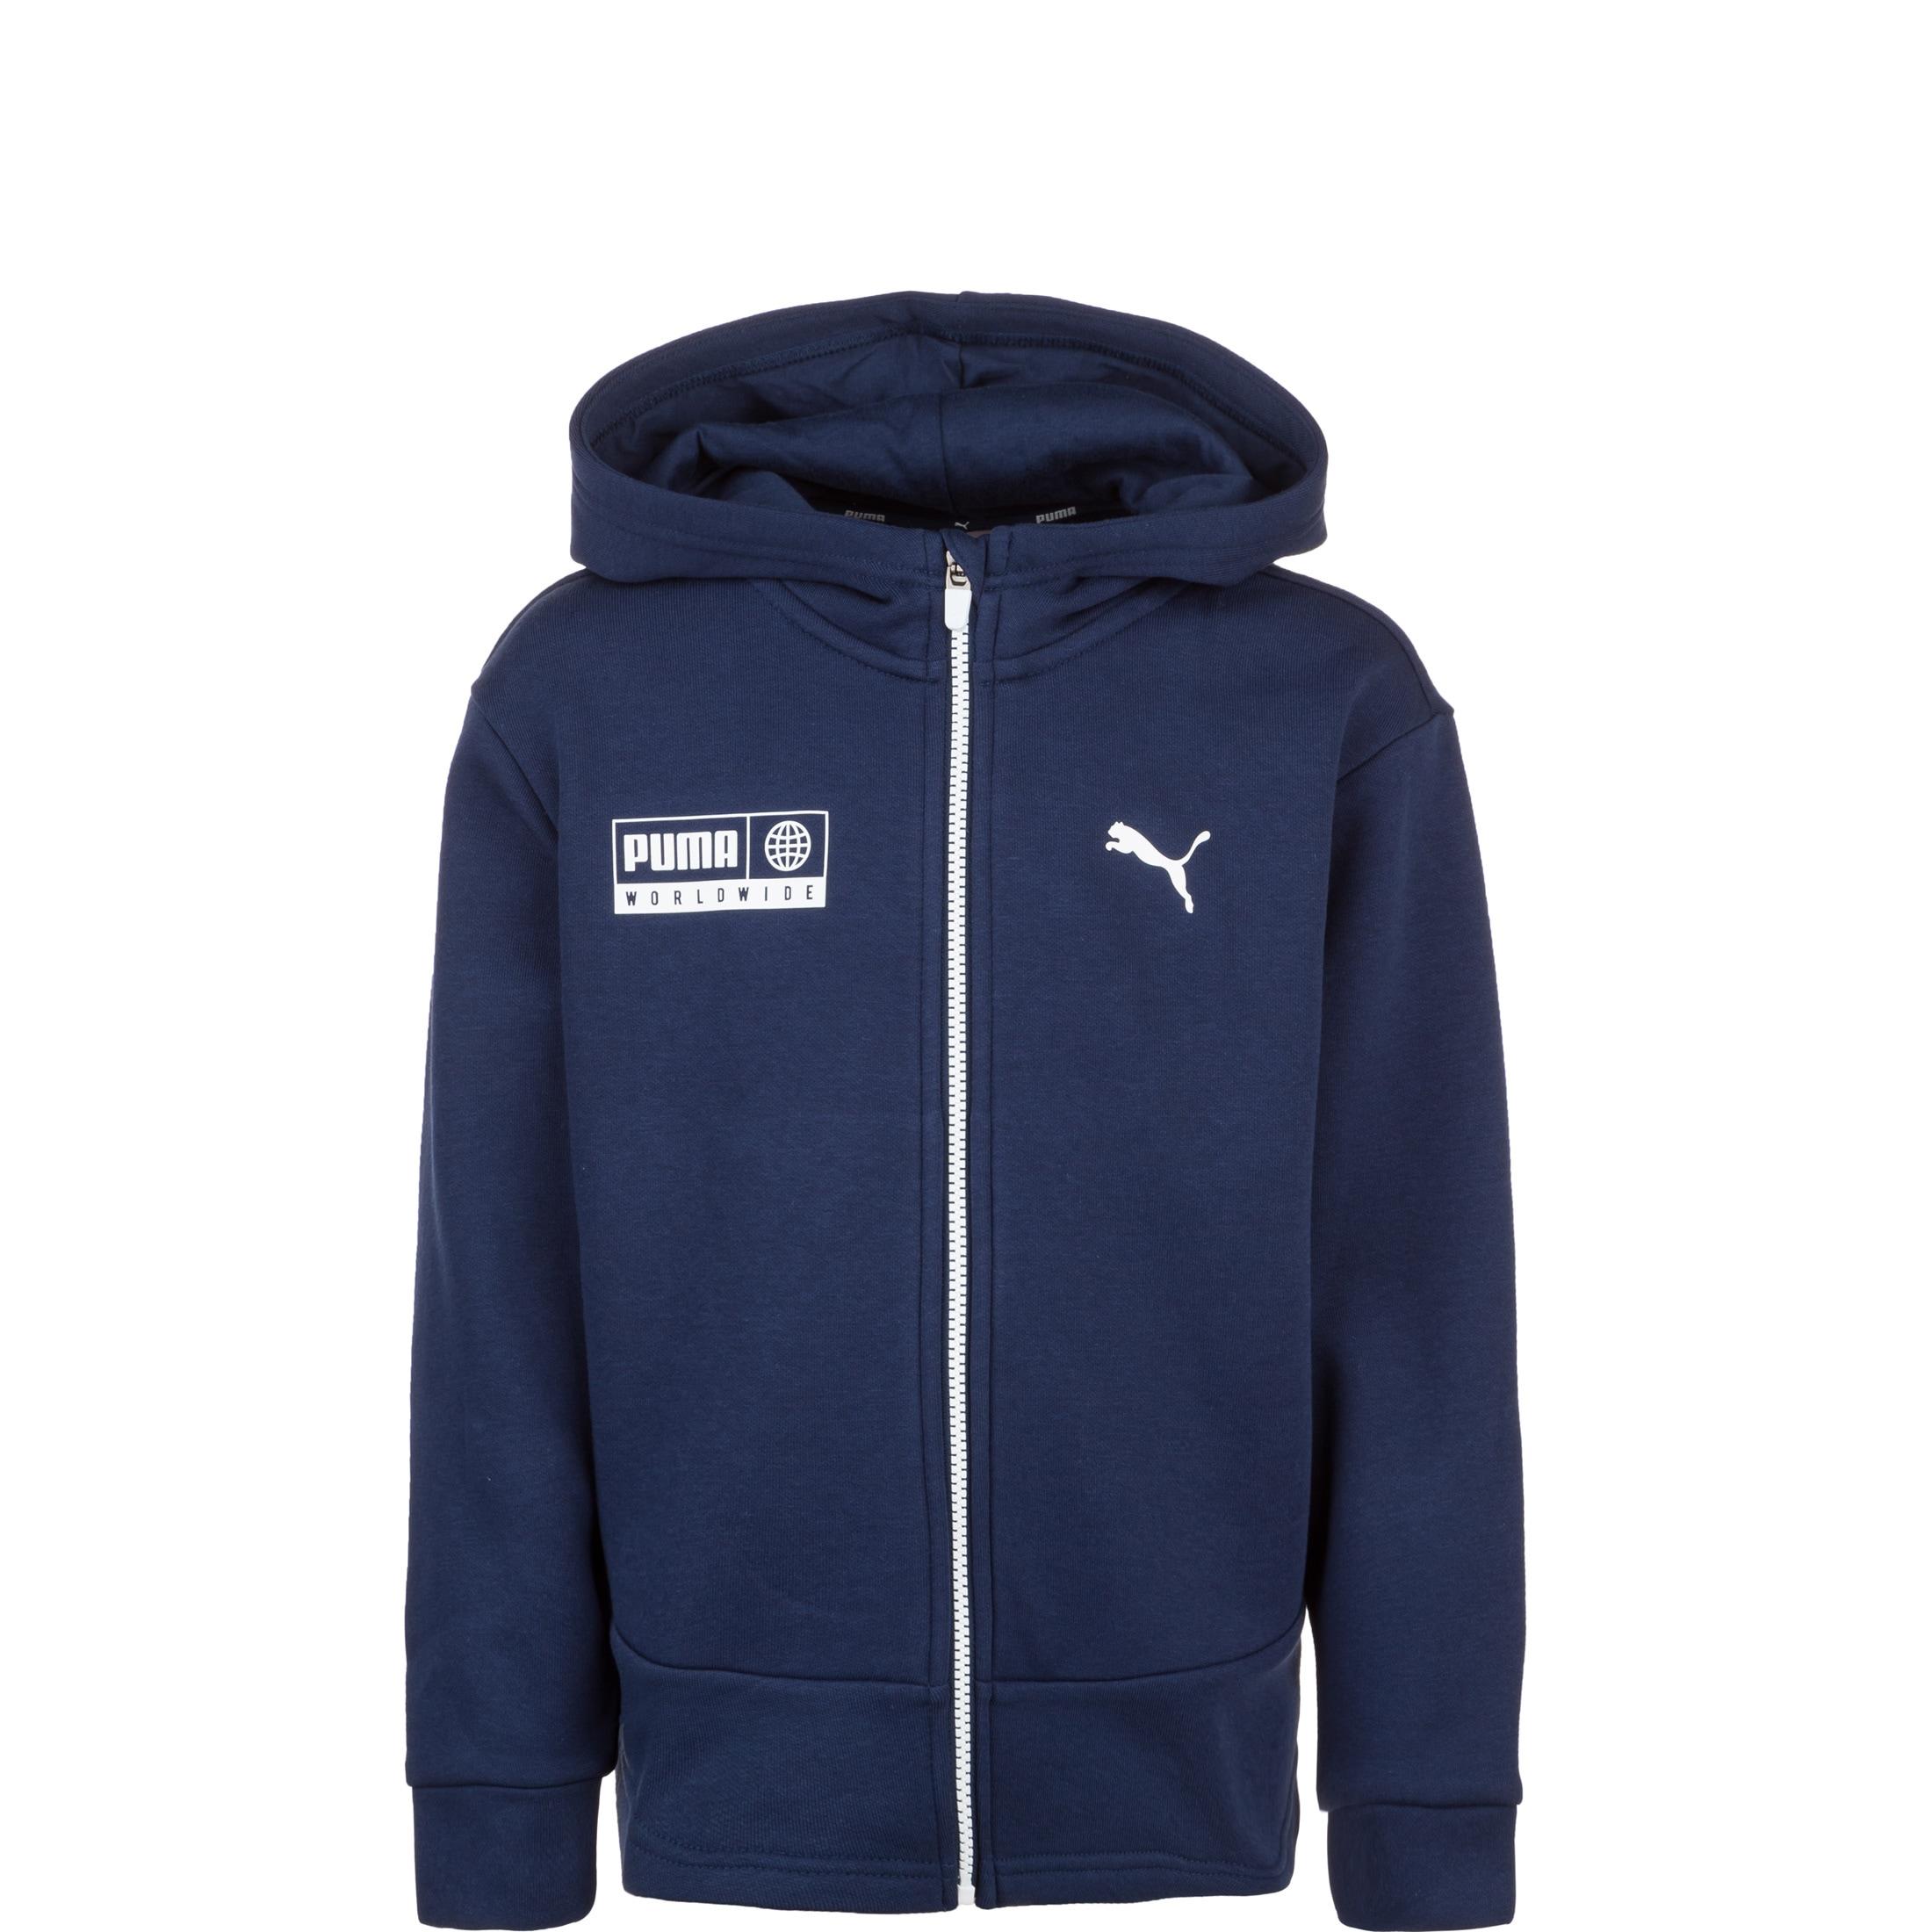 PUMA Trainingsjacke Alpha Graphic | Sportbekleidung > Sportjacken > Trainingsjacken | Blau | Puma